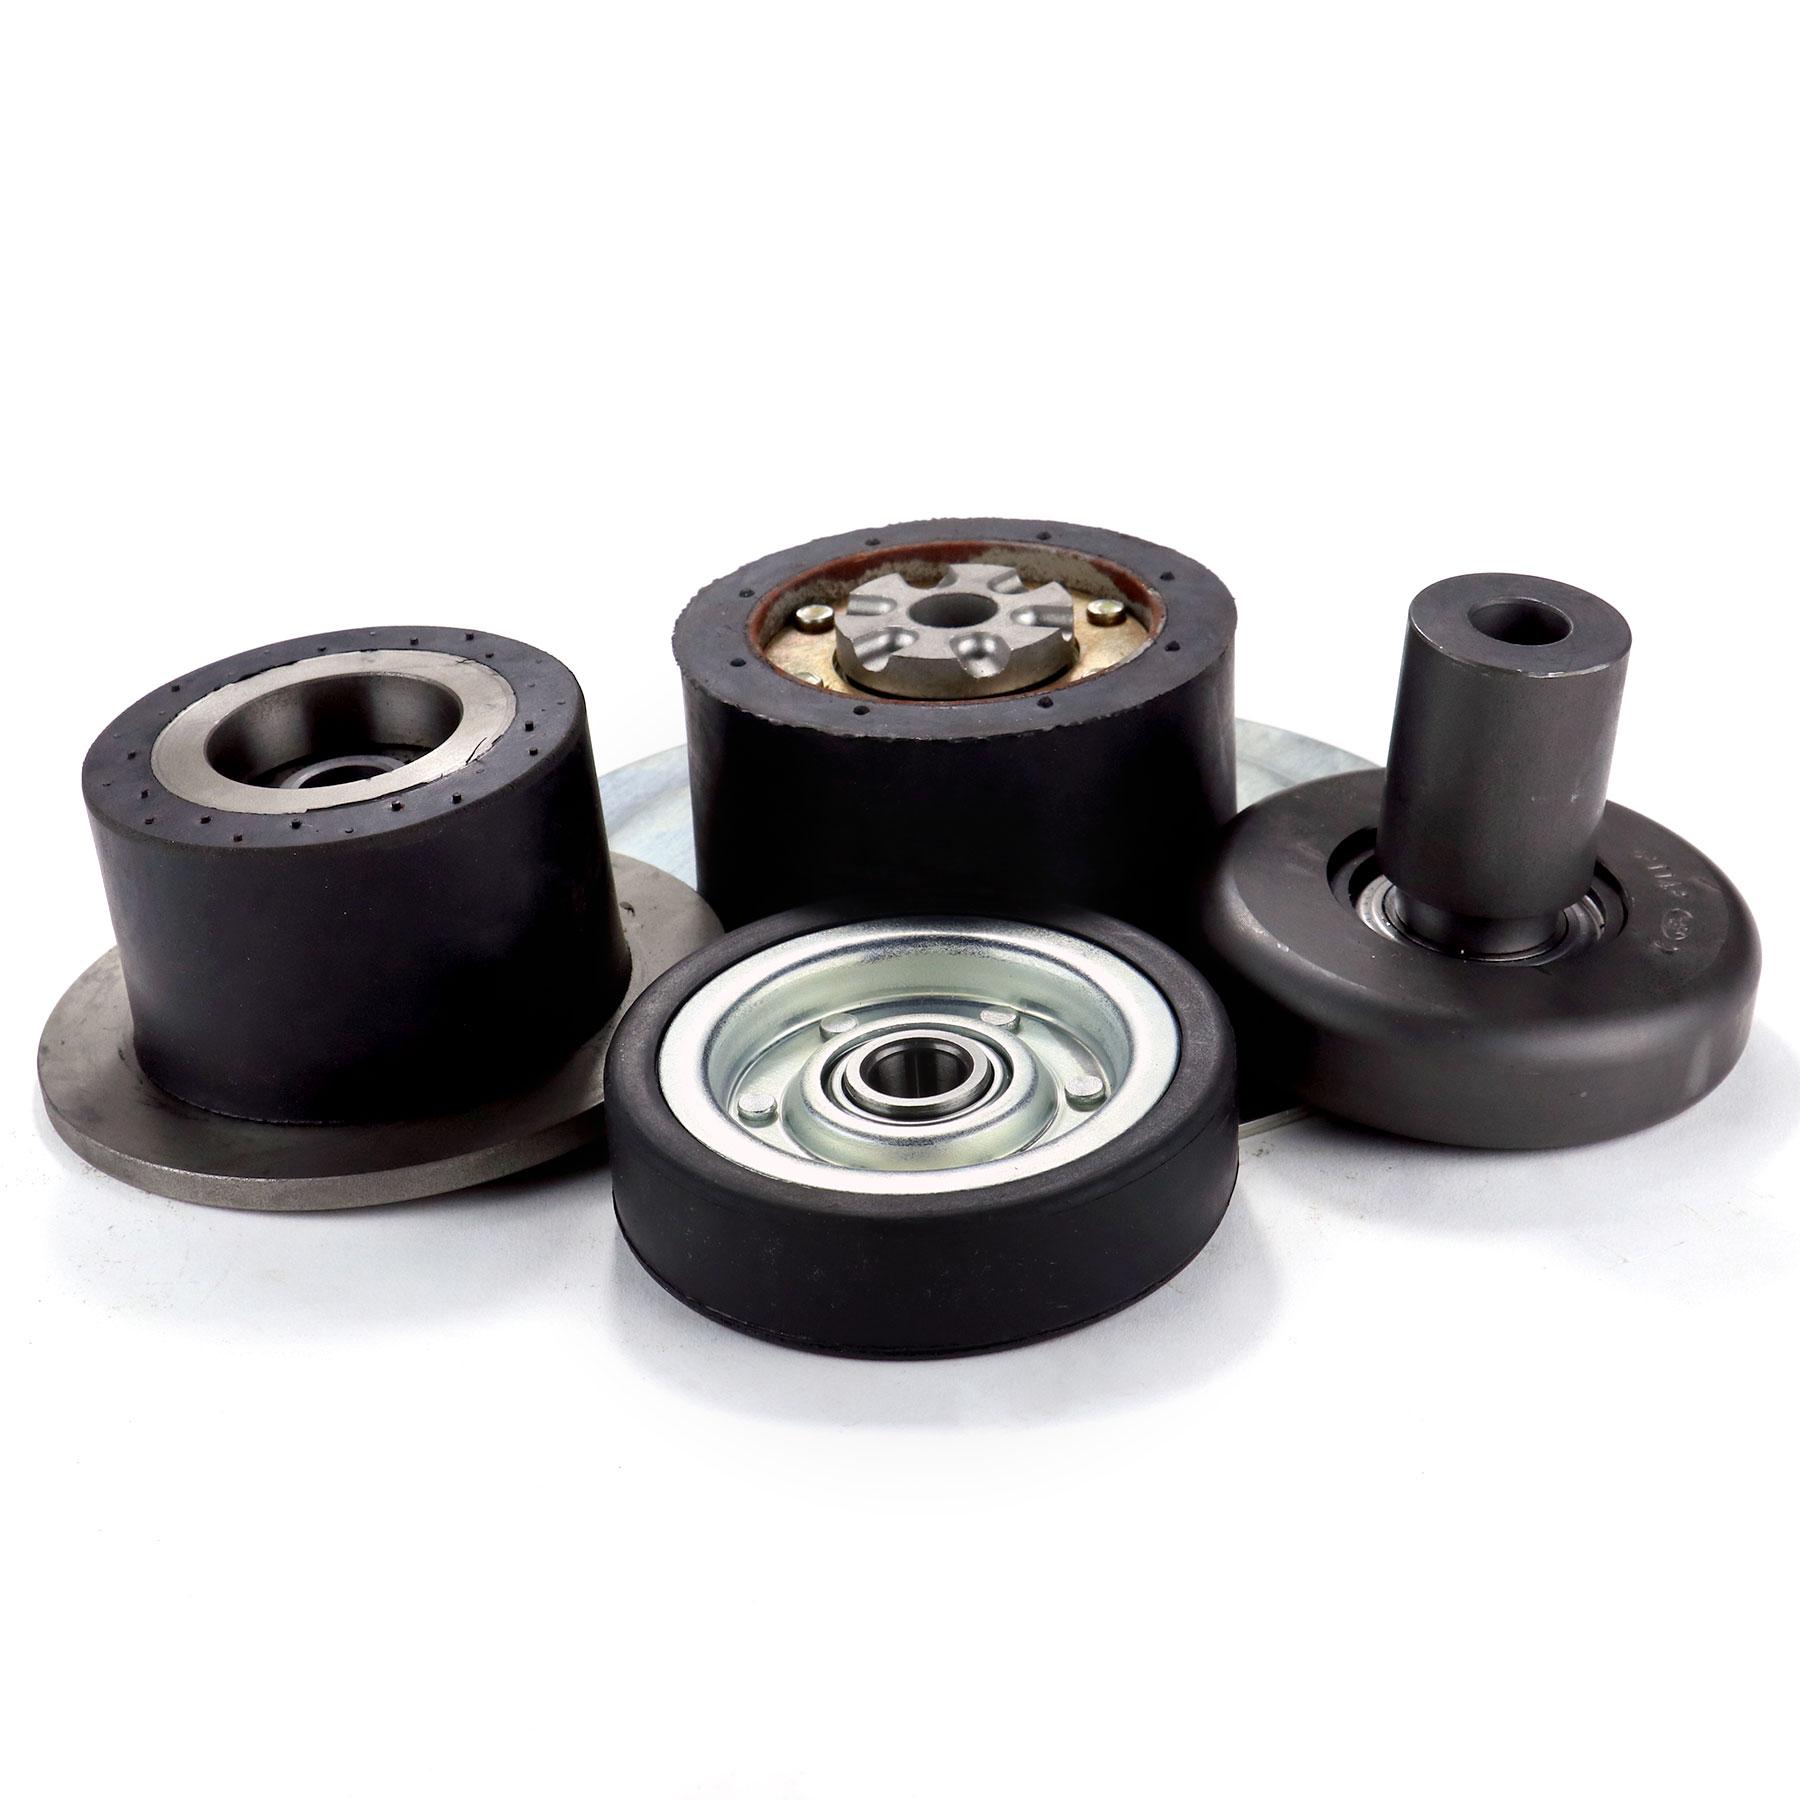 rollers, L&M Specialty Fabrication Batavia NY